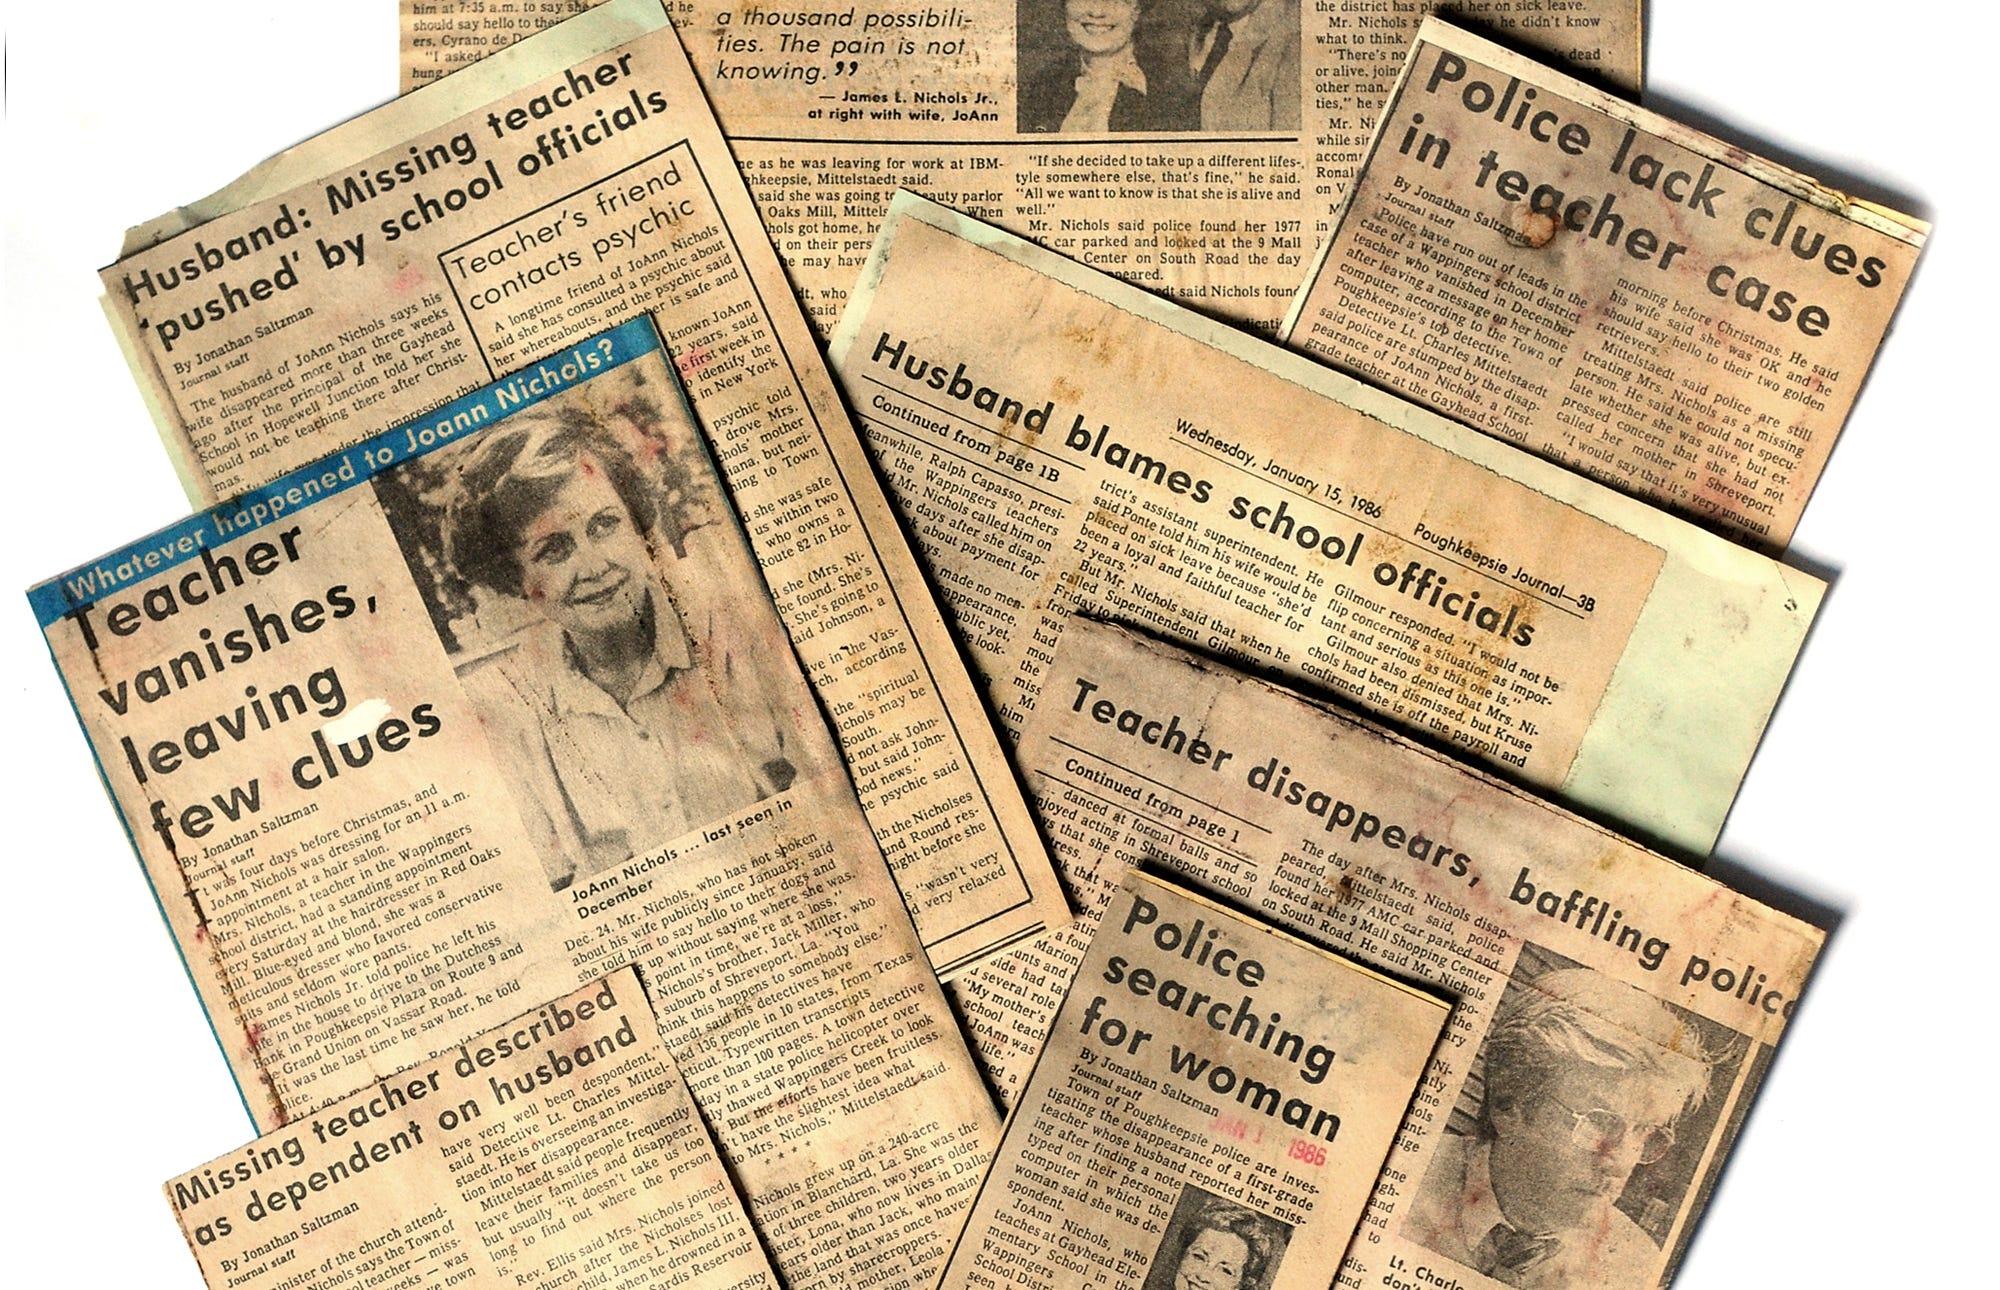 Poughkeepsie journal classifieds jobs